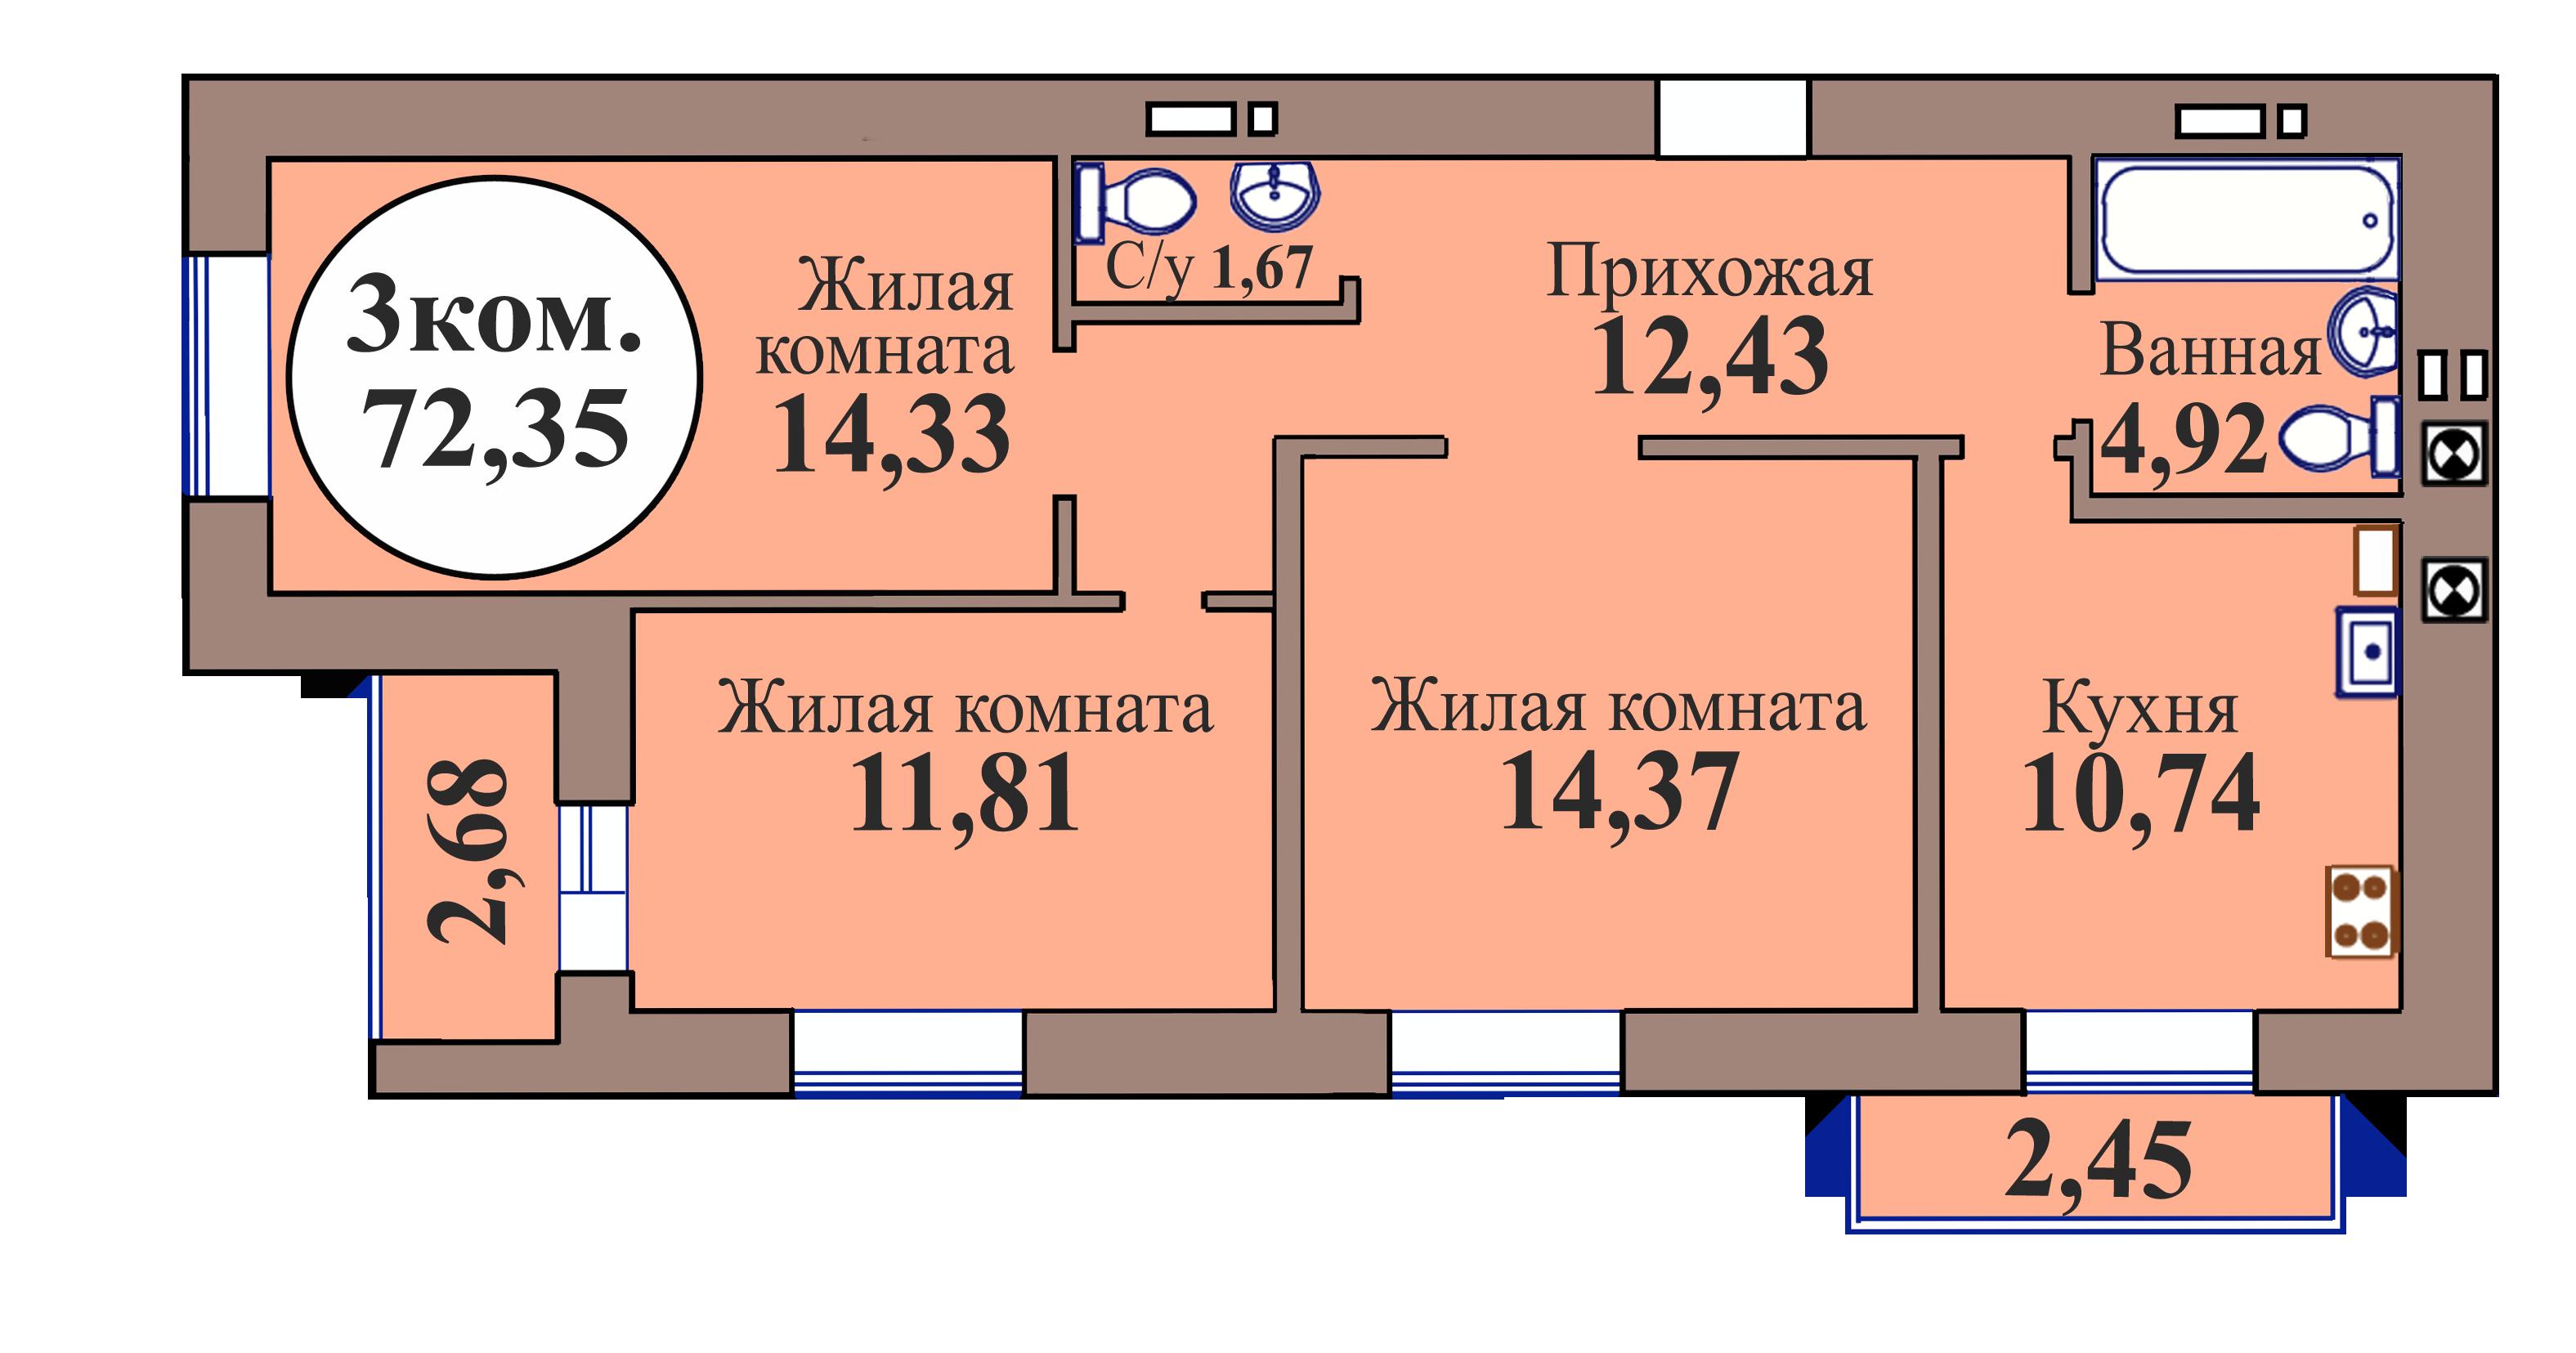 3-комн. кв. по пер. Калининградский, 5 кв. 170 в Калининграде